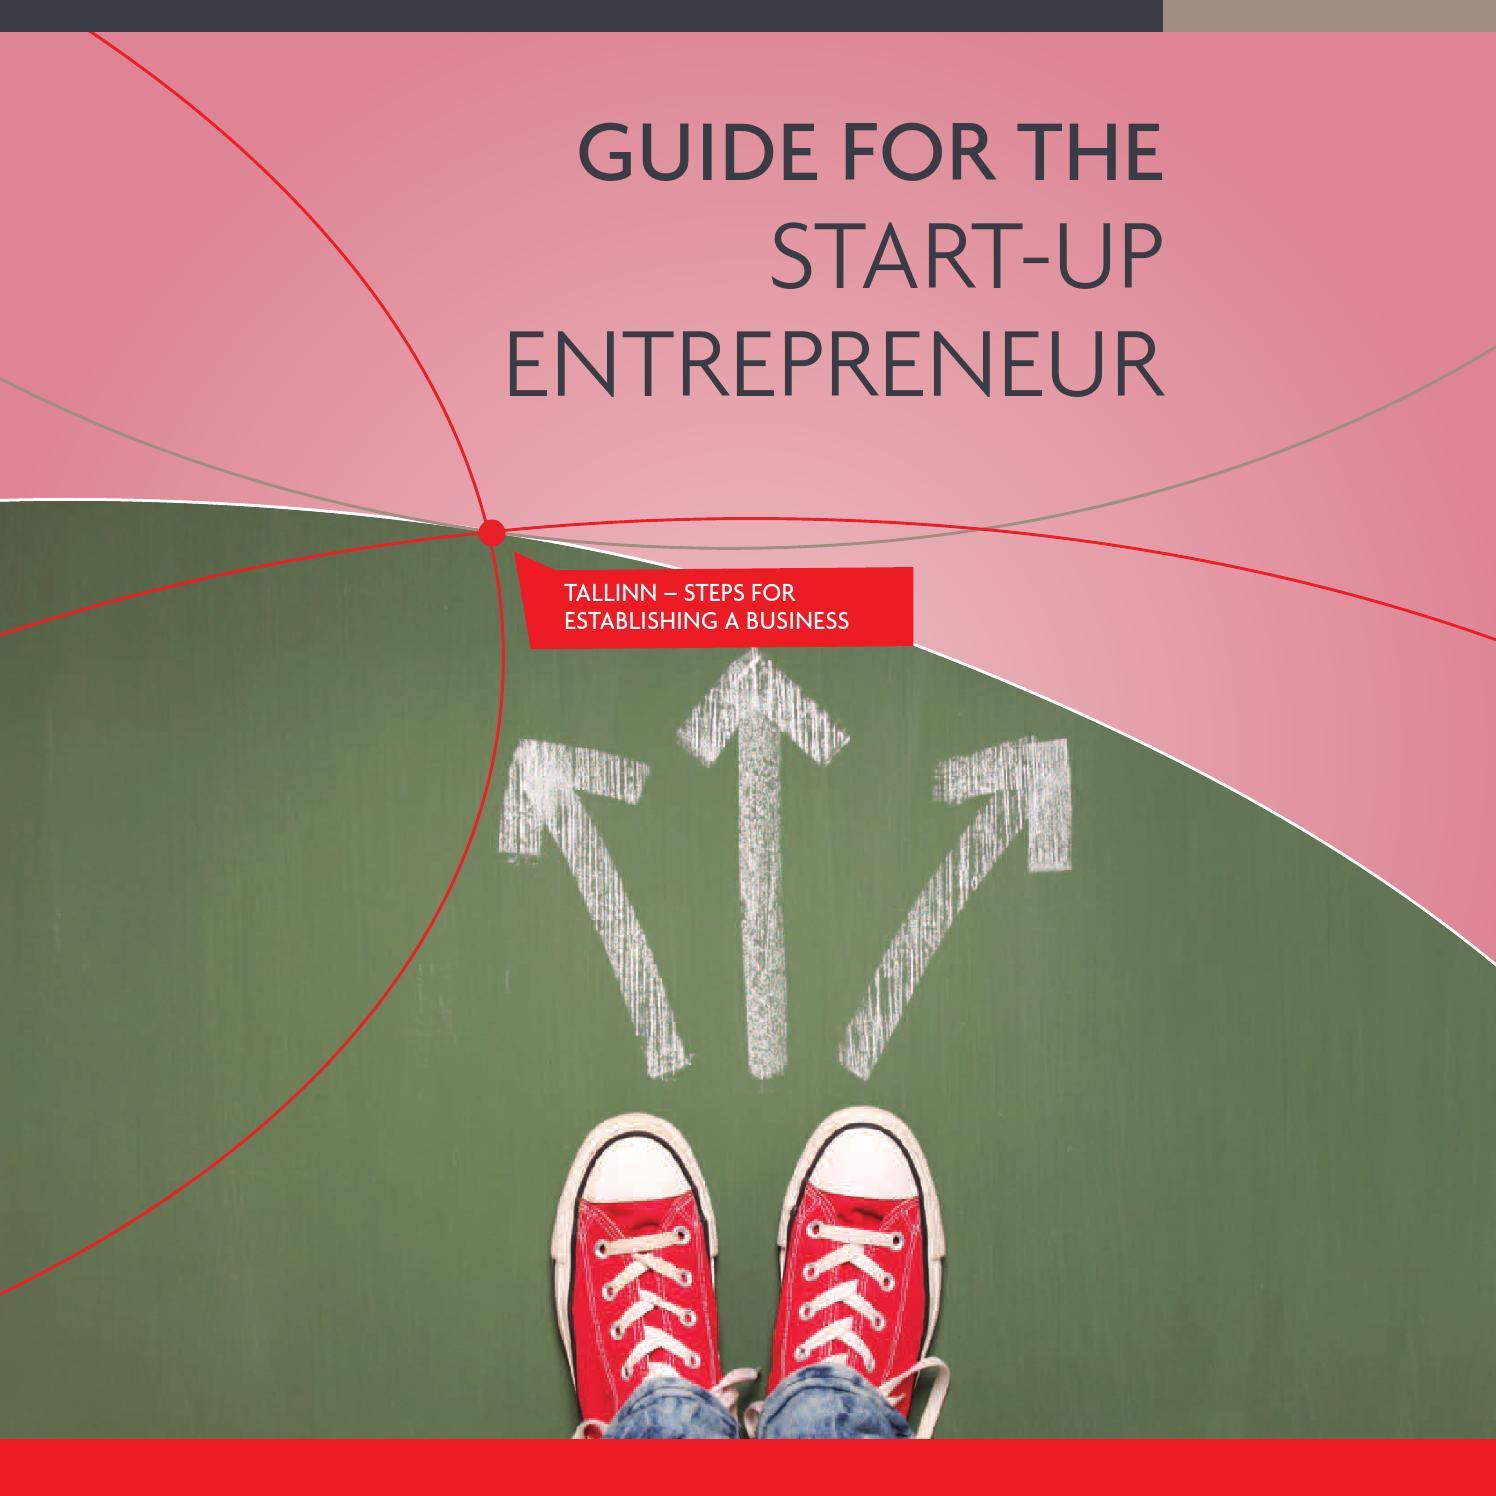 126065ee915 Guide for the start-up entrepreneur by Tallinna linnavalitsus - issuu